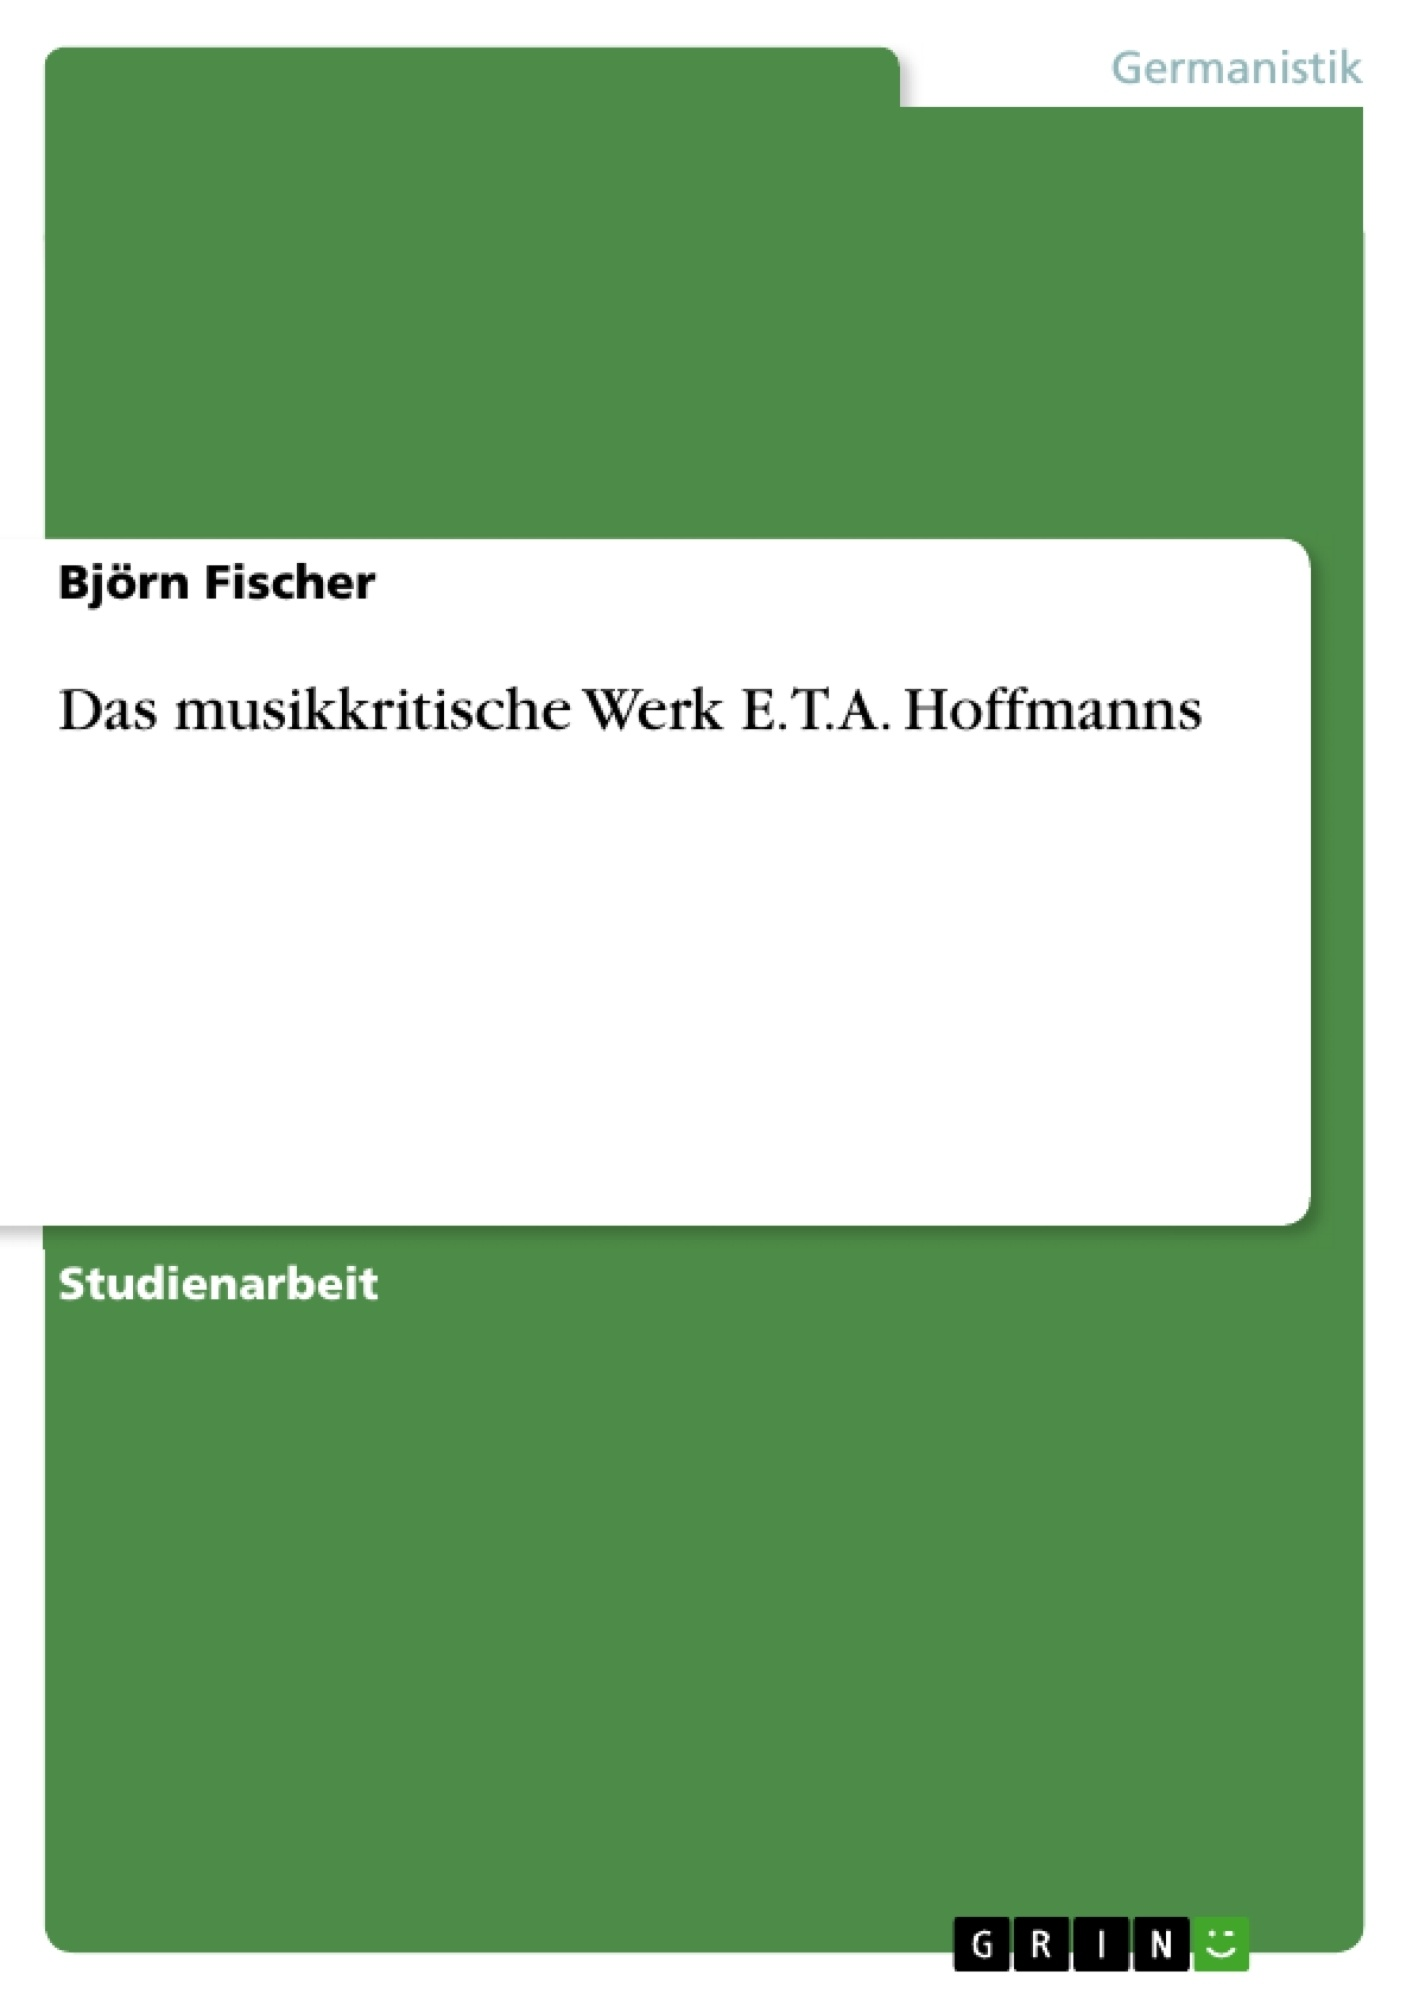 Titel: Das musikkritische Werk E.T.A. Hoffmanns